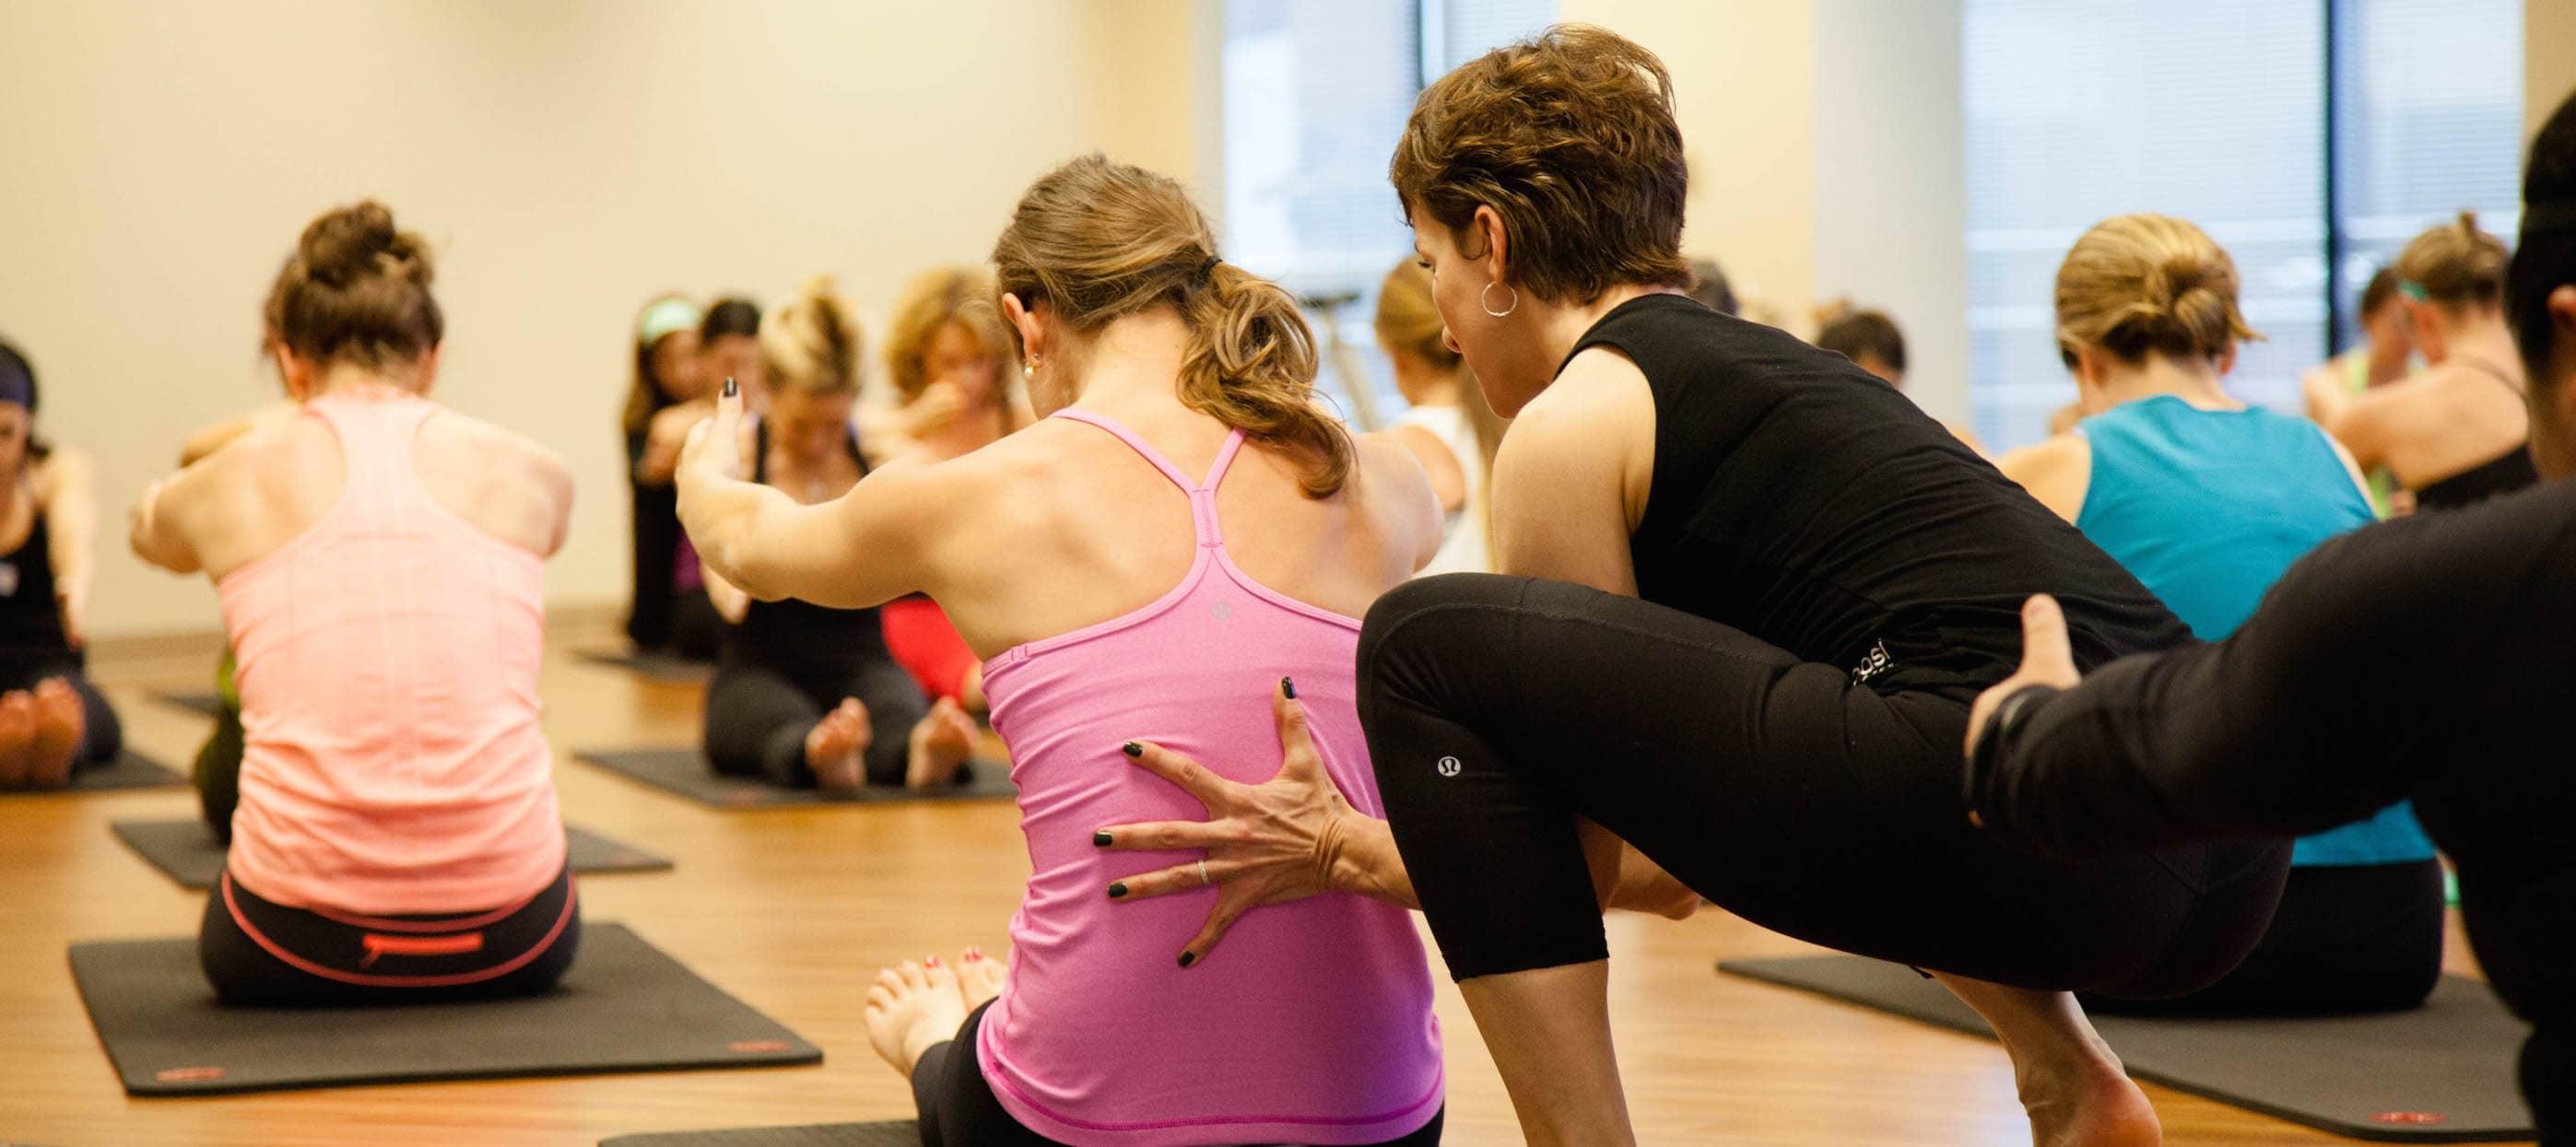 Basi Pilates 174 Teacher Training Foundation Apparatus And